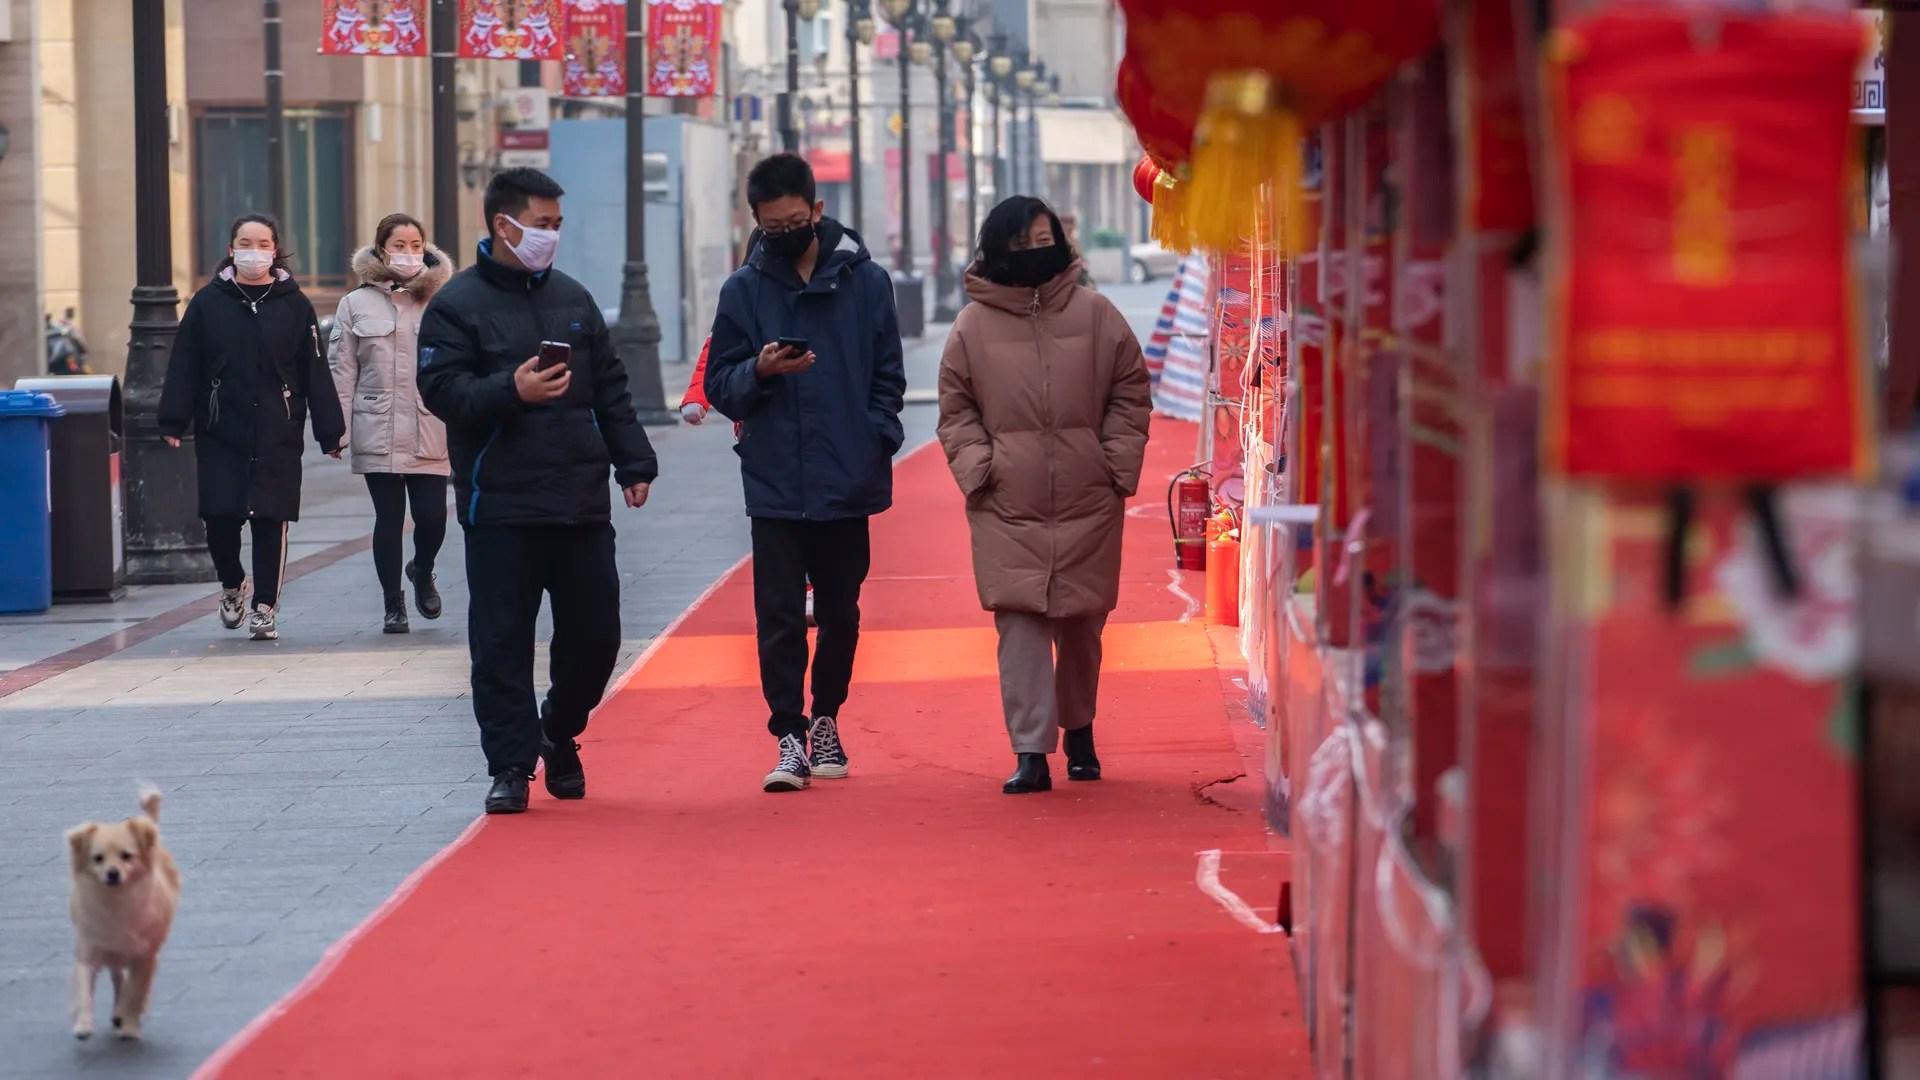 Coronavirus: China confirms cases in all regions - Axios